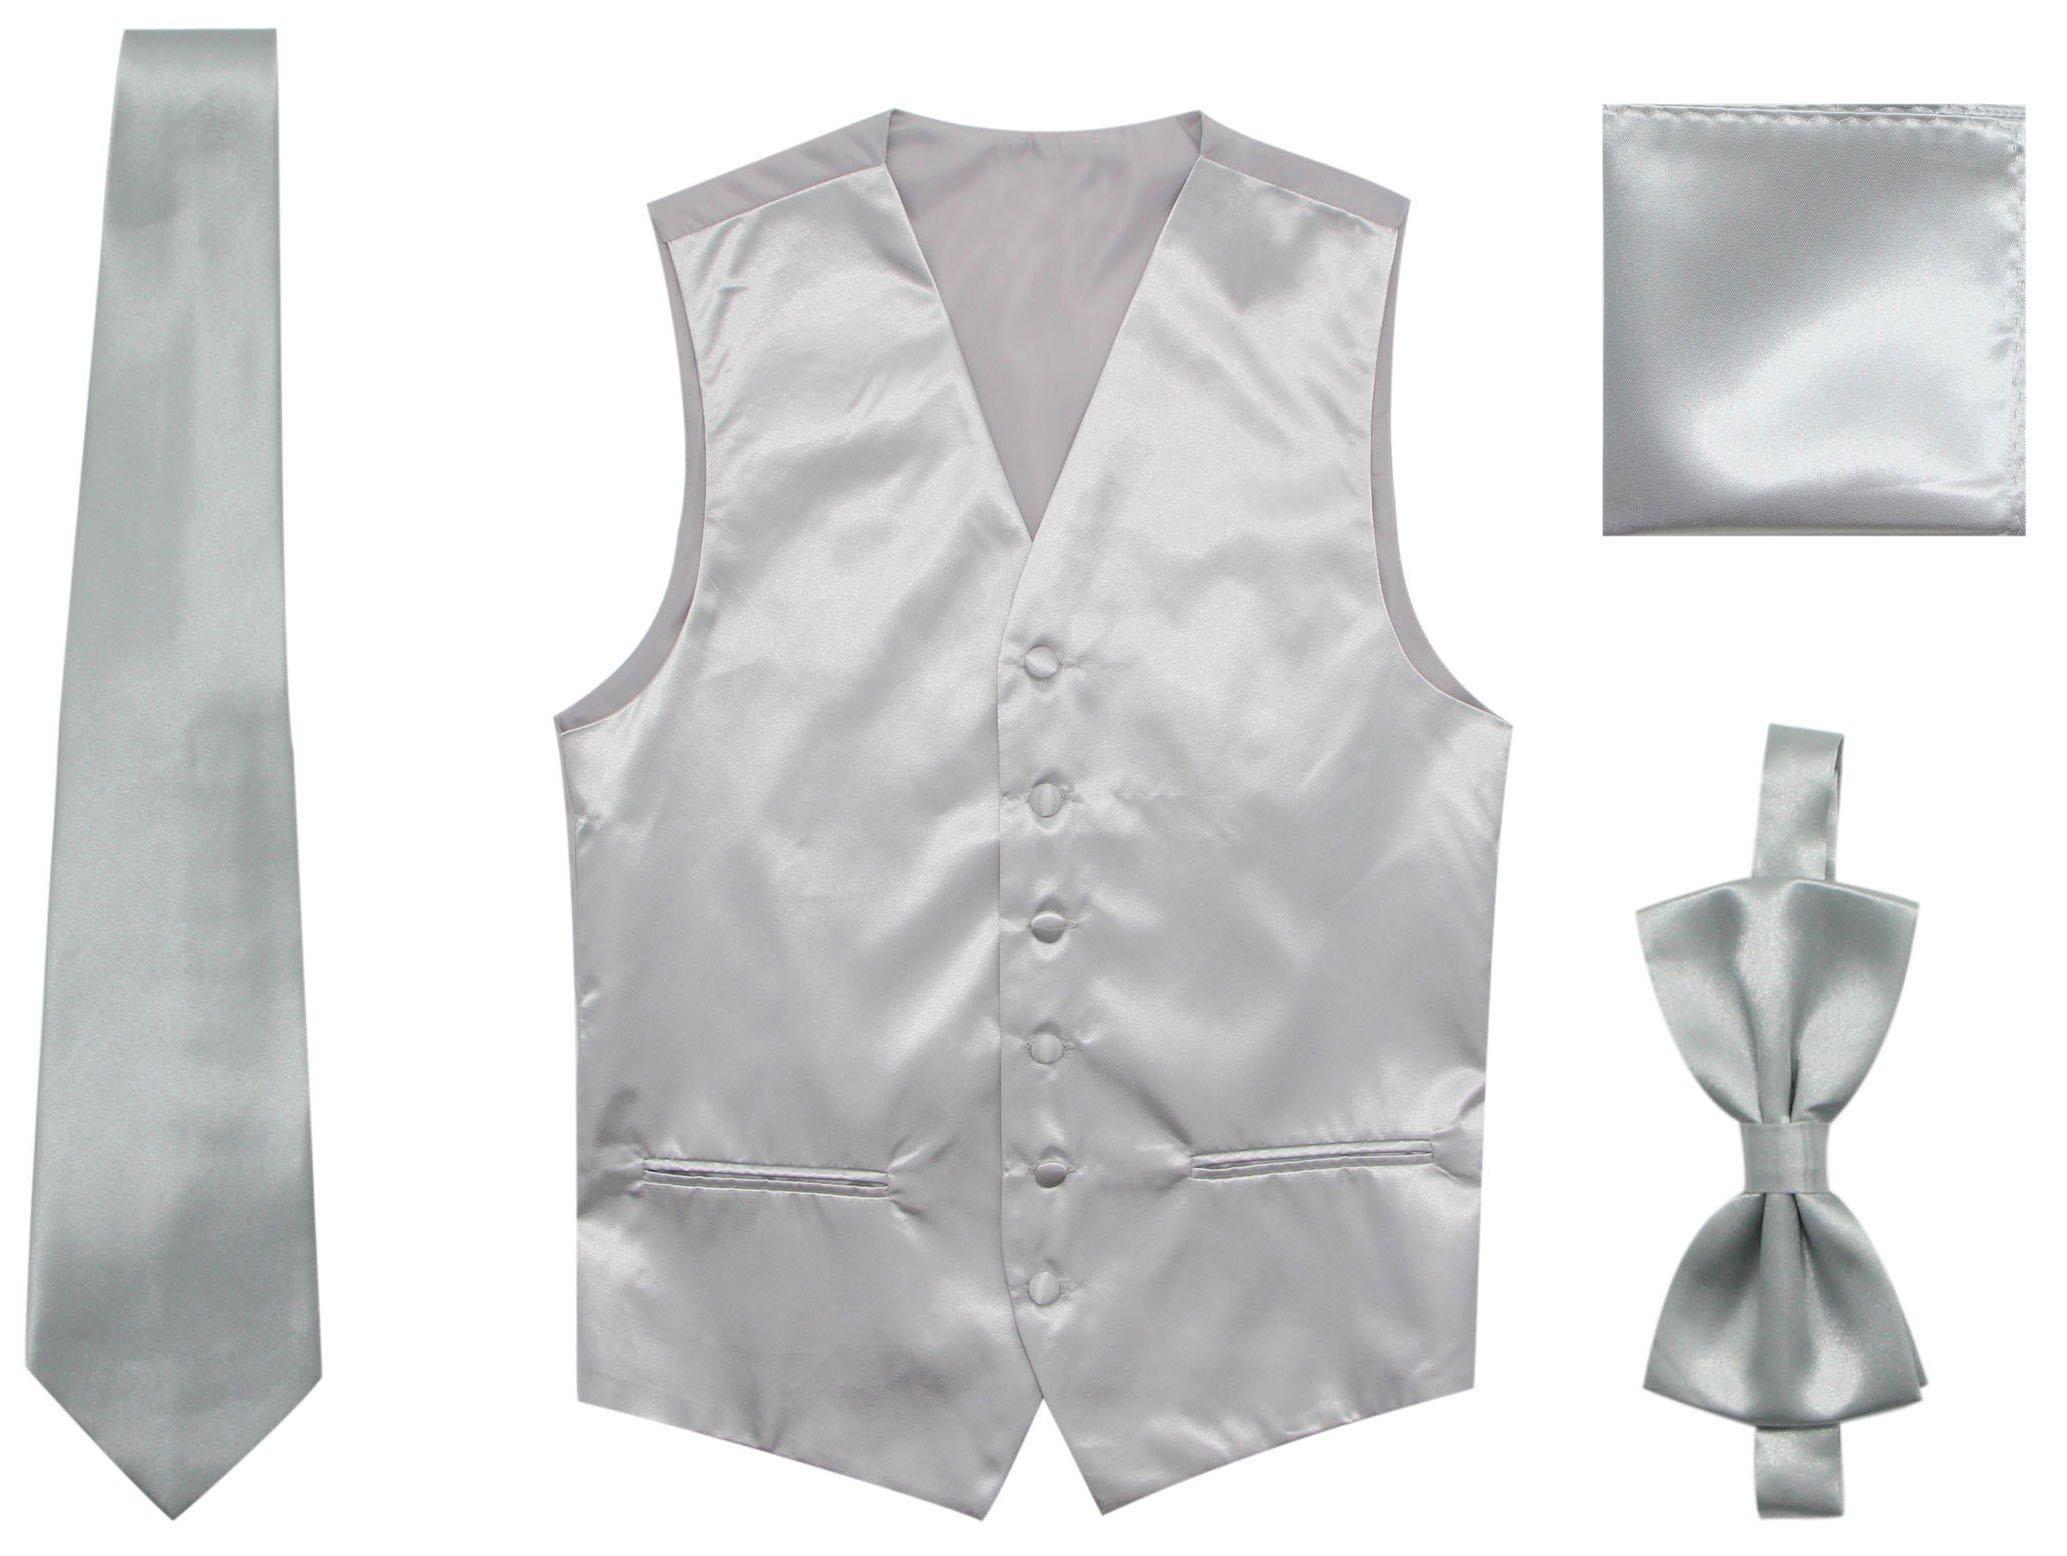 JAIFEI Satin Men Wedding Vest – Set Neck Tie, Bow Tie & Handkerchief (M(Chest 39), Sliver)